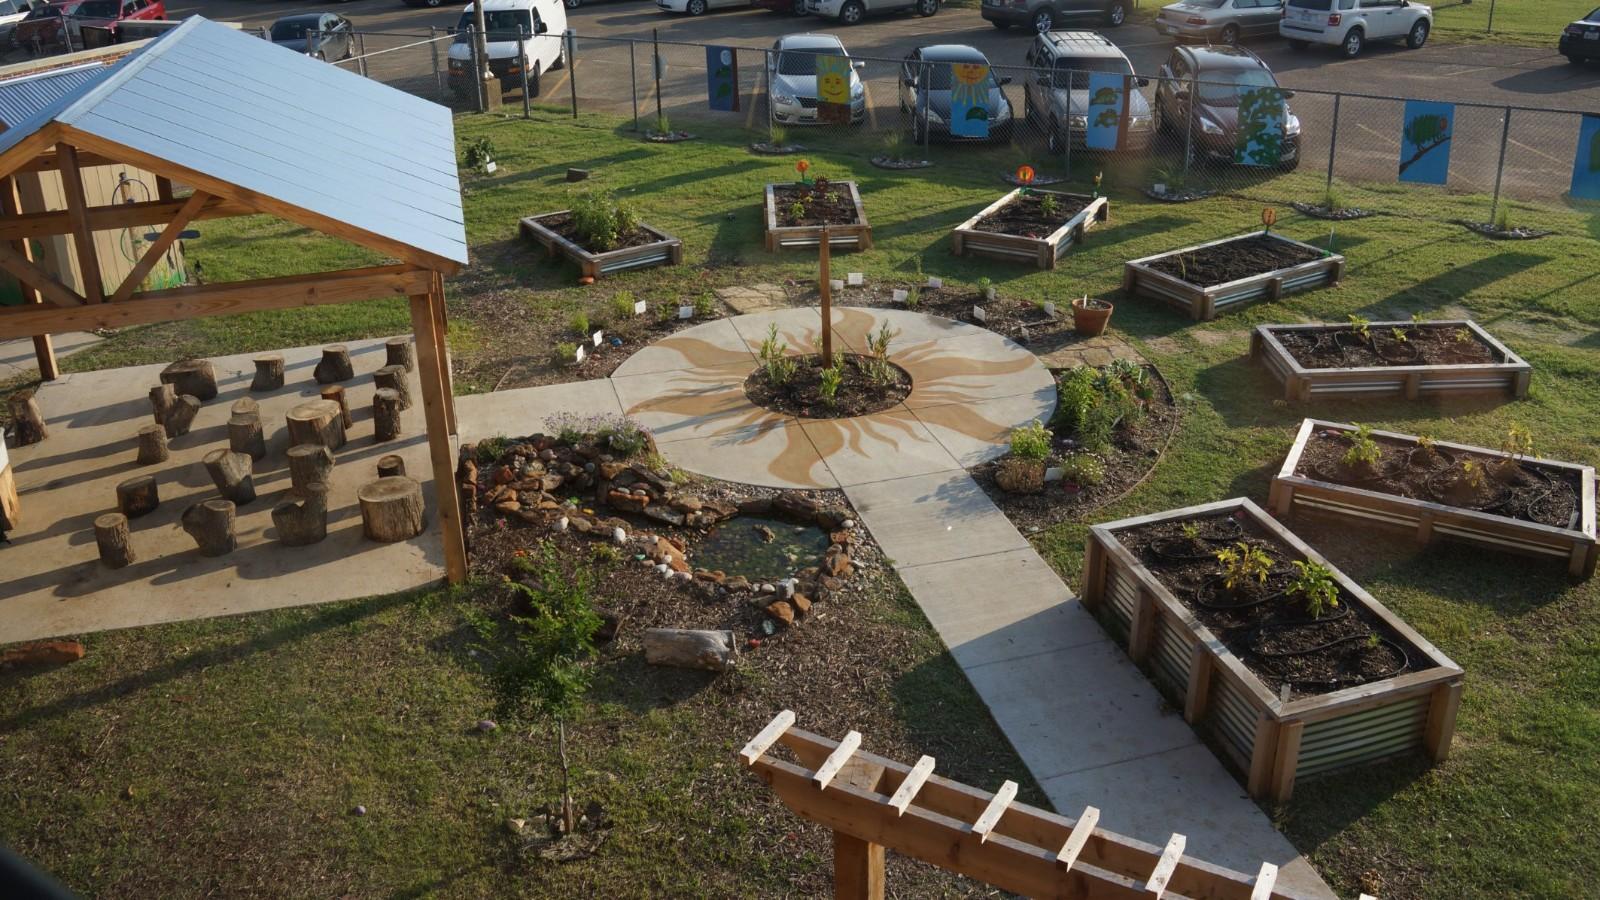 Garden Design School the blossoming health benefits of school gardens - cnn